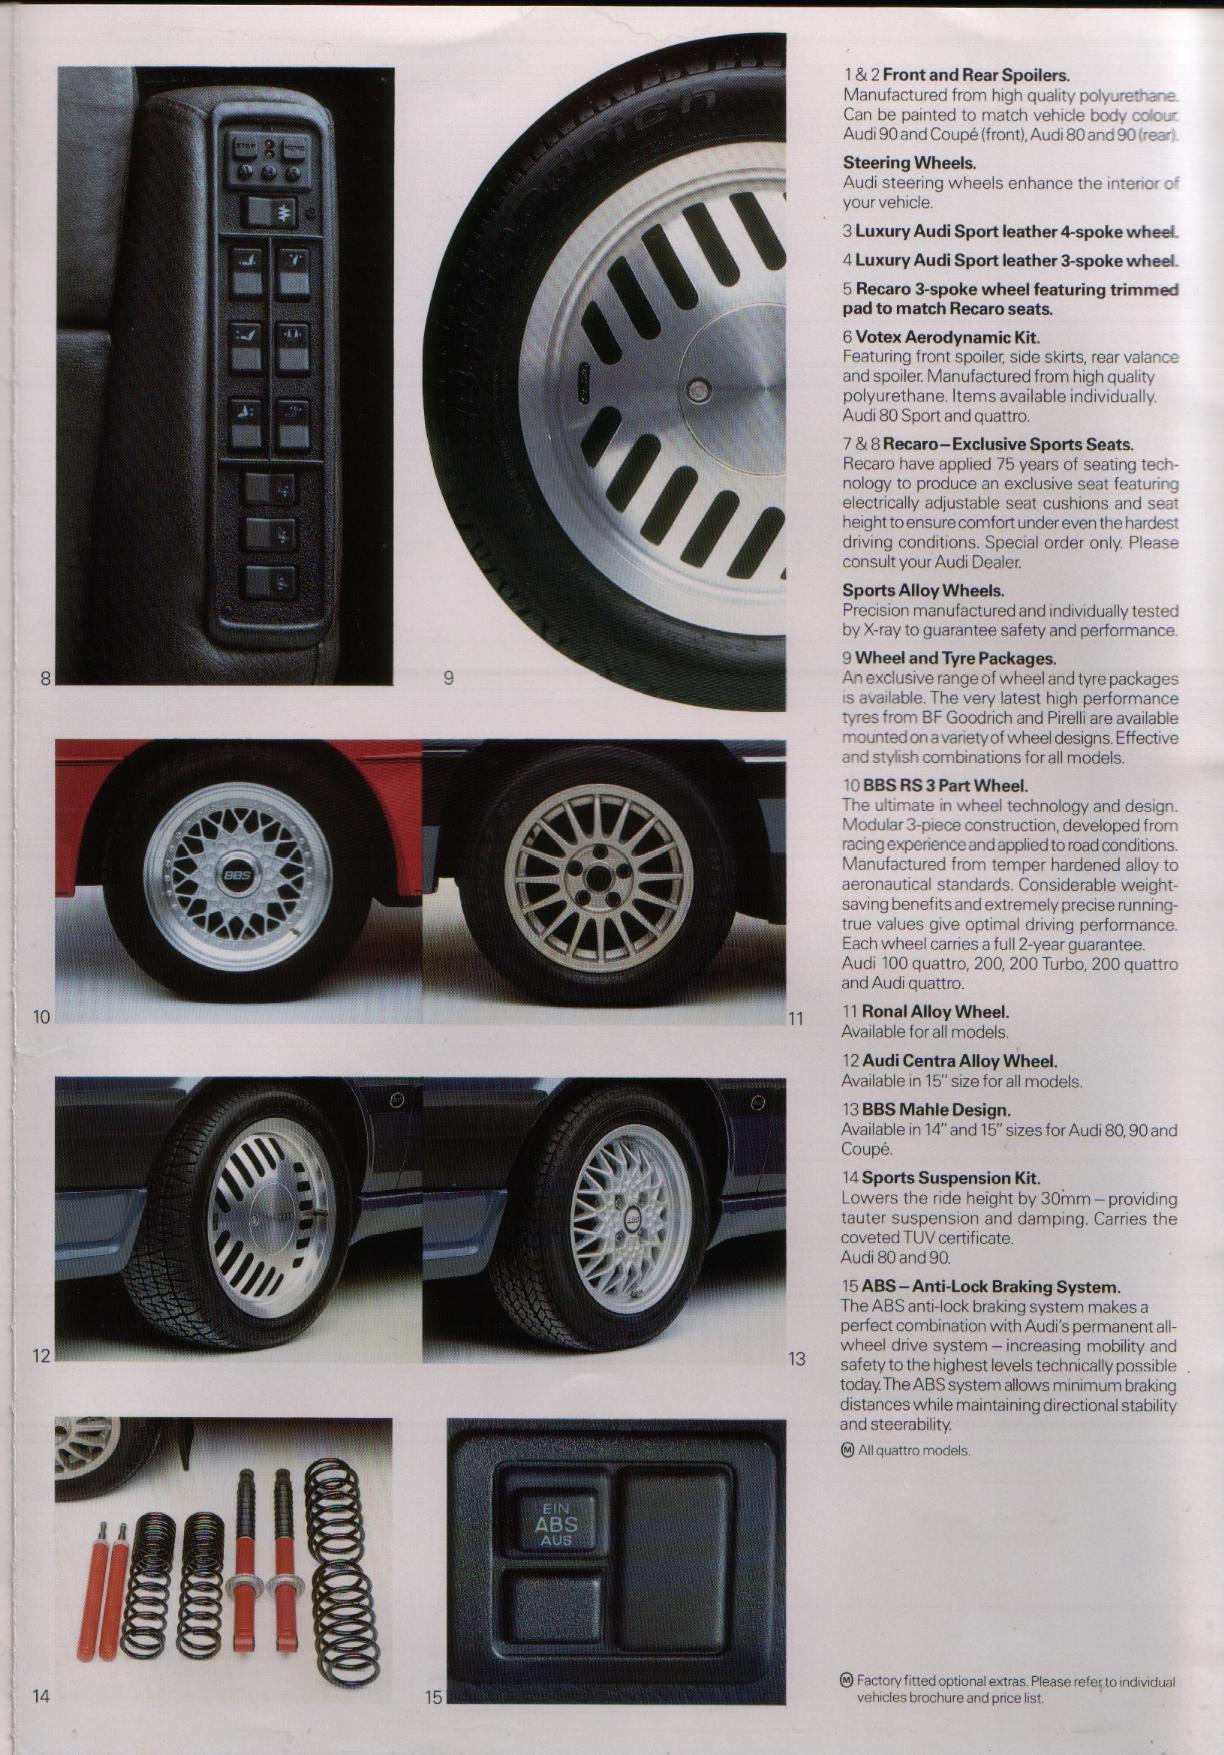 M 39 n nieuwste aanwinst pagina 4 for Audi 80 interieur